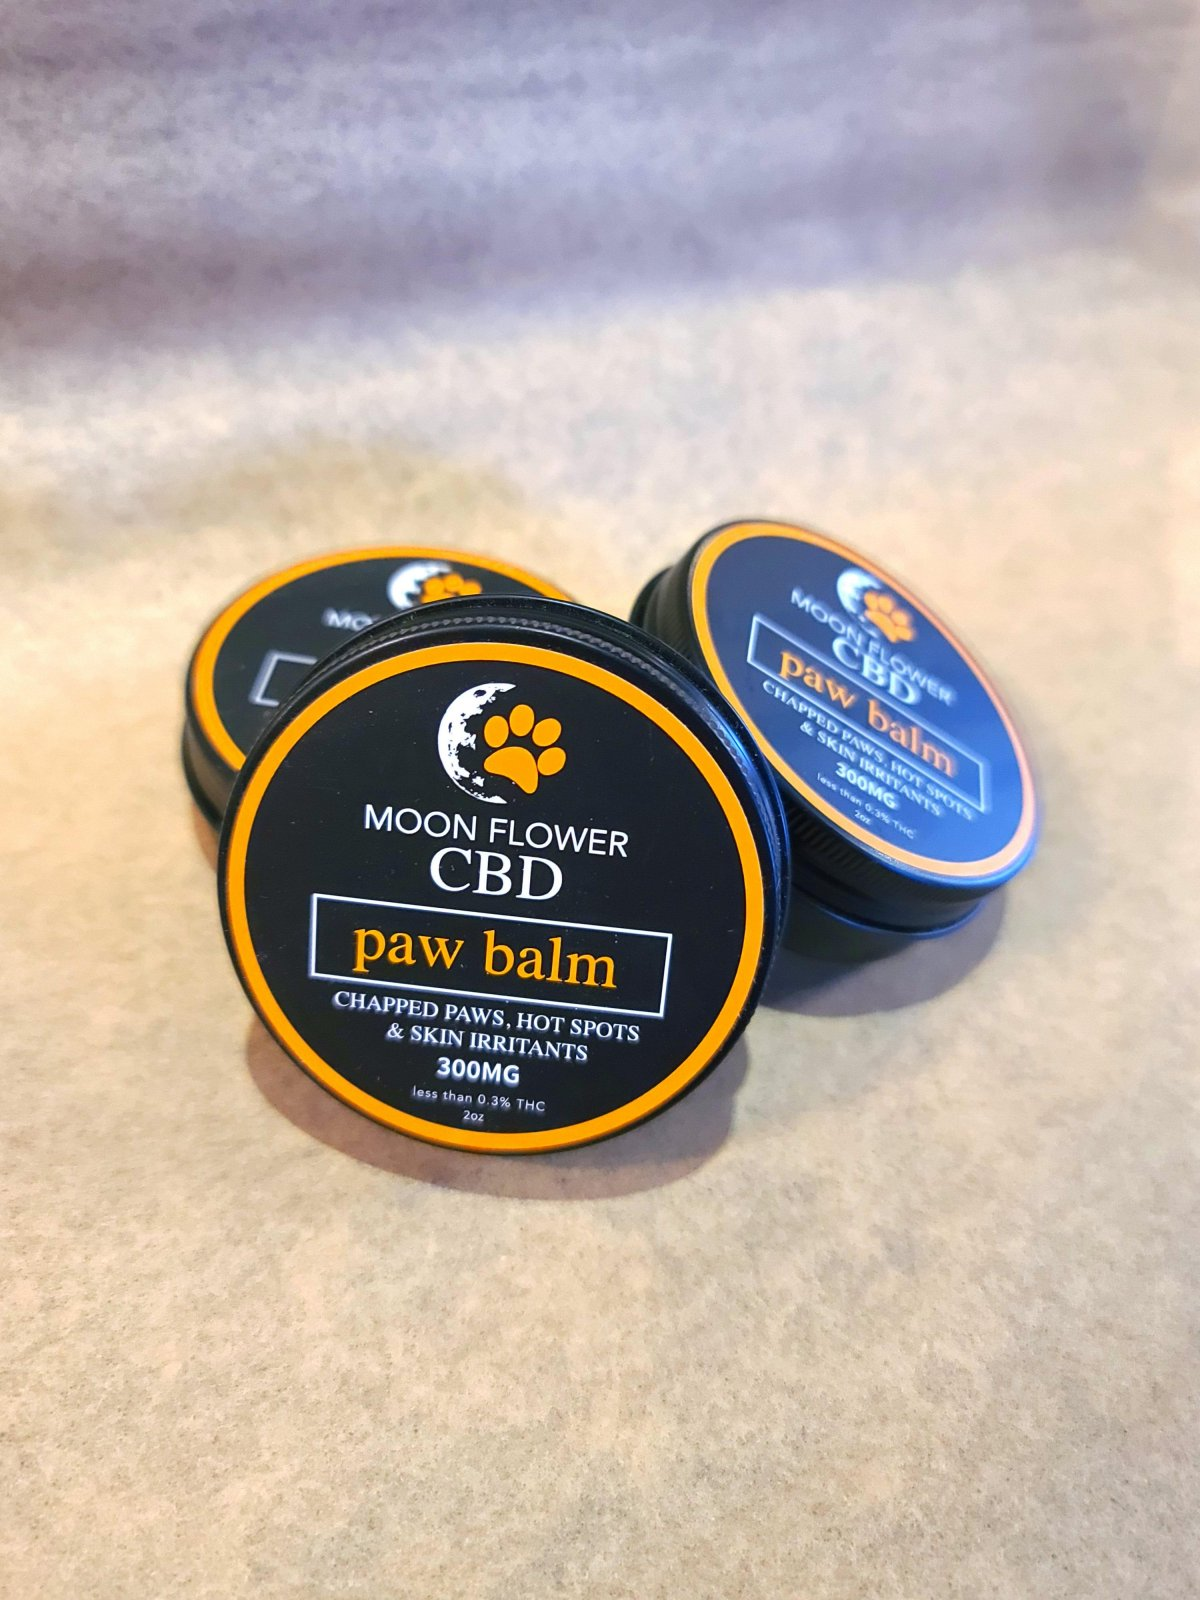 300mg Moonflower Paw Balm